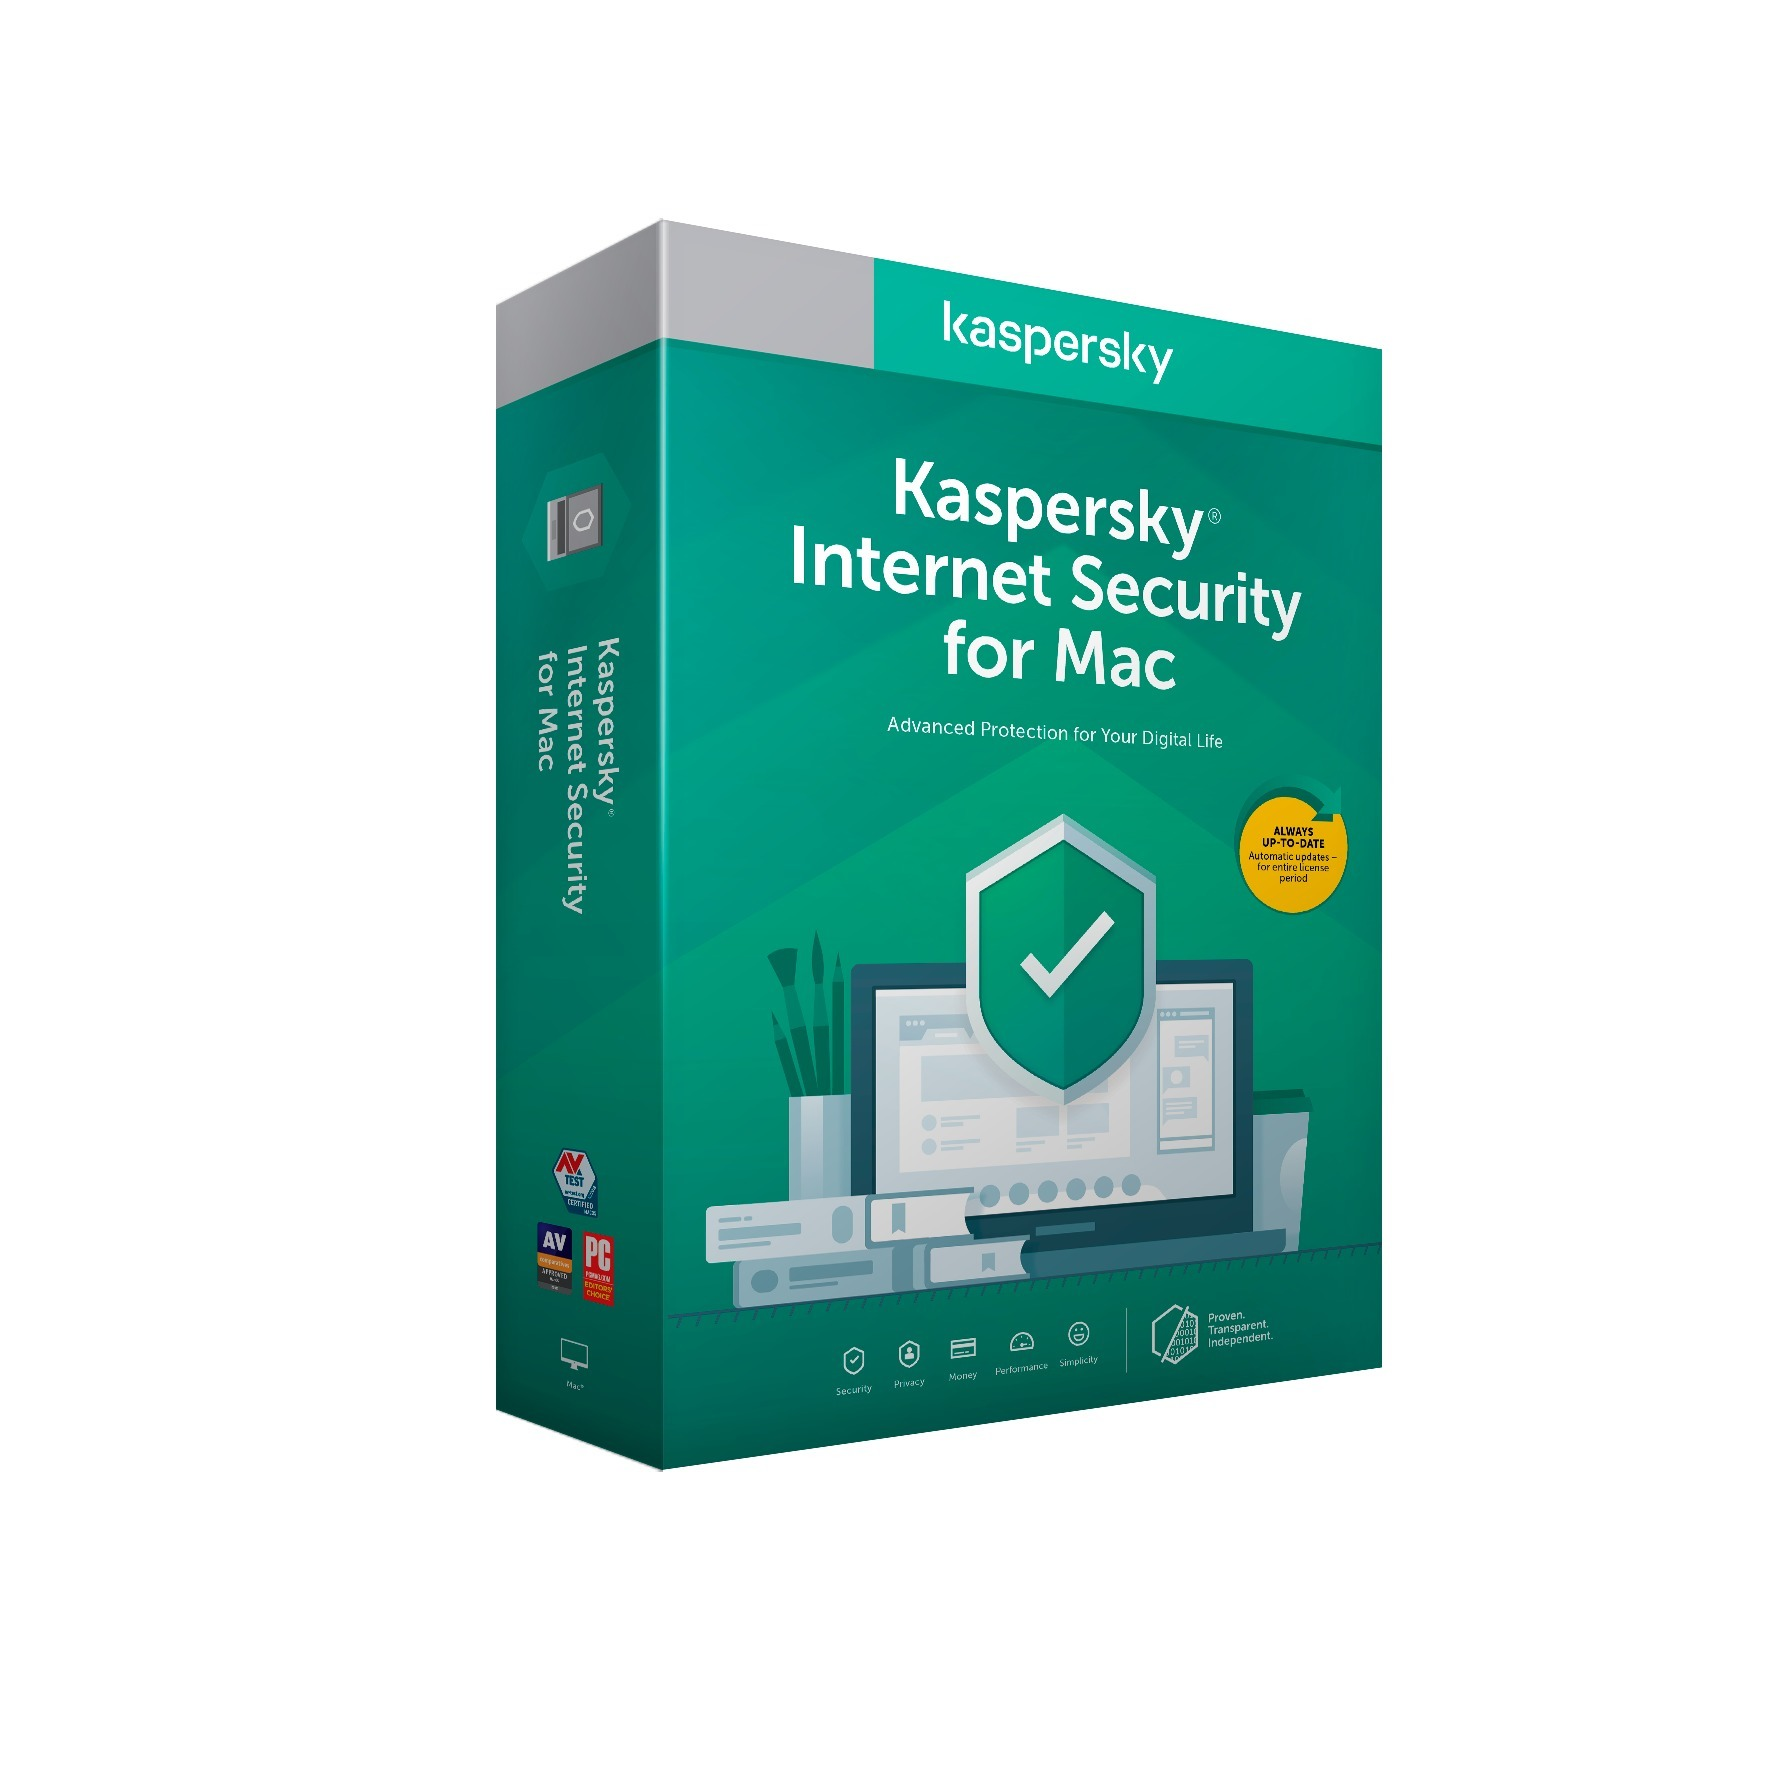 Kaspersky Internet Security for Mac 2020